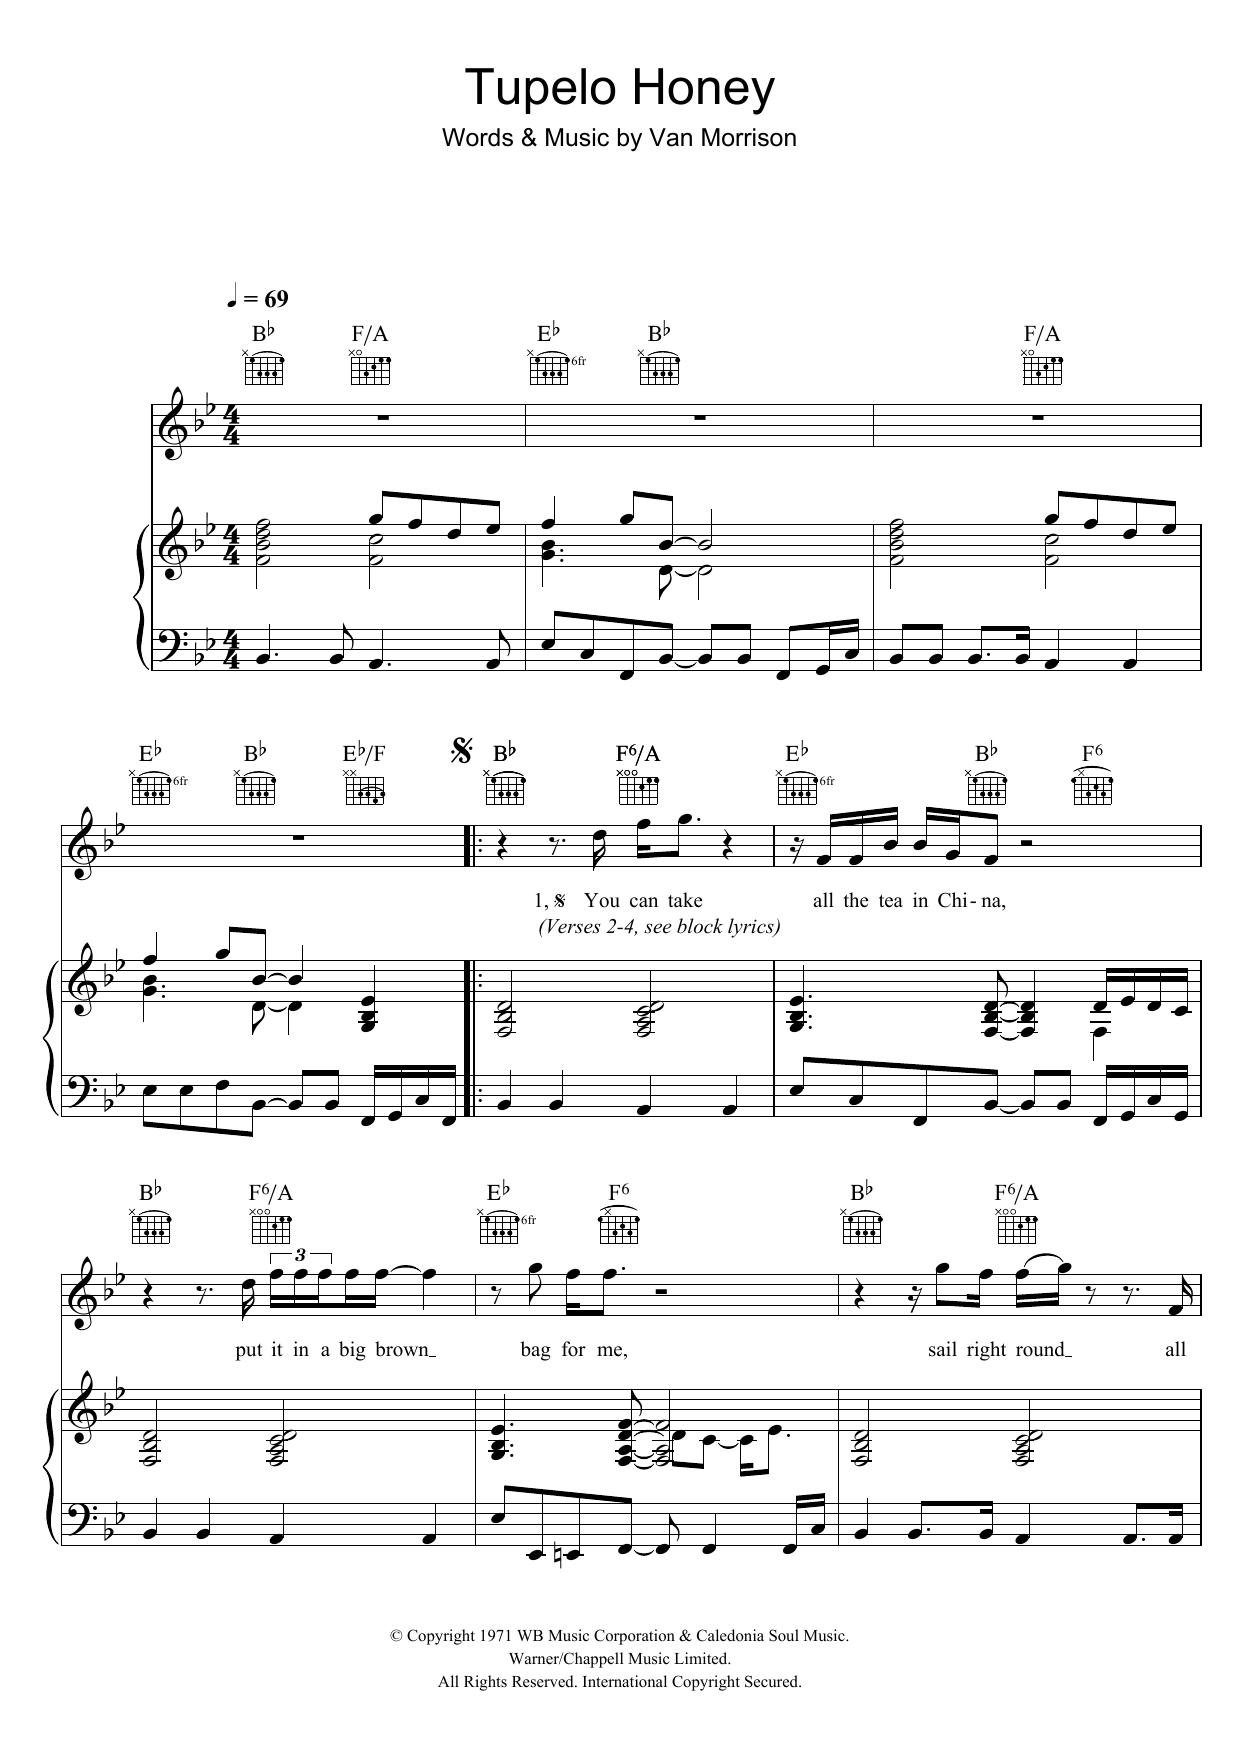 Tupelo Honey Van Morrison Piano Vocal Guitar